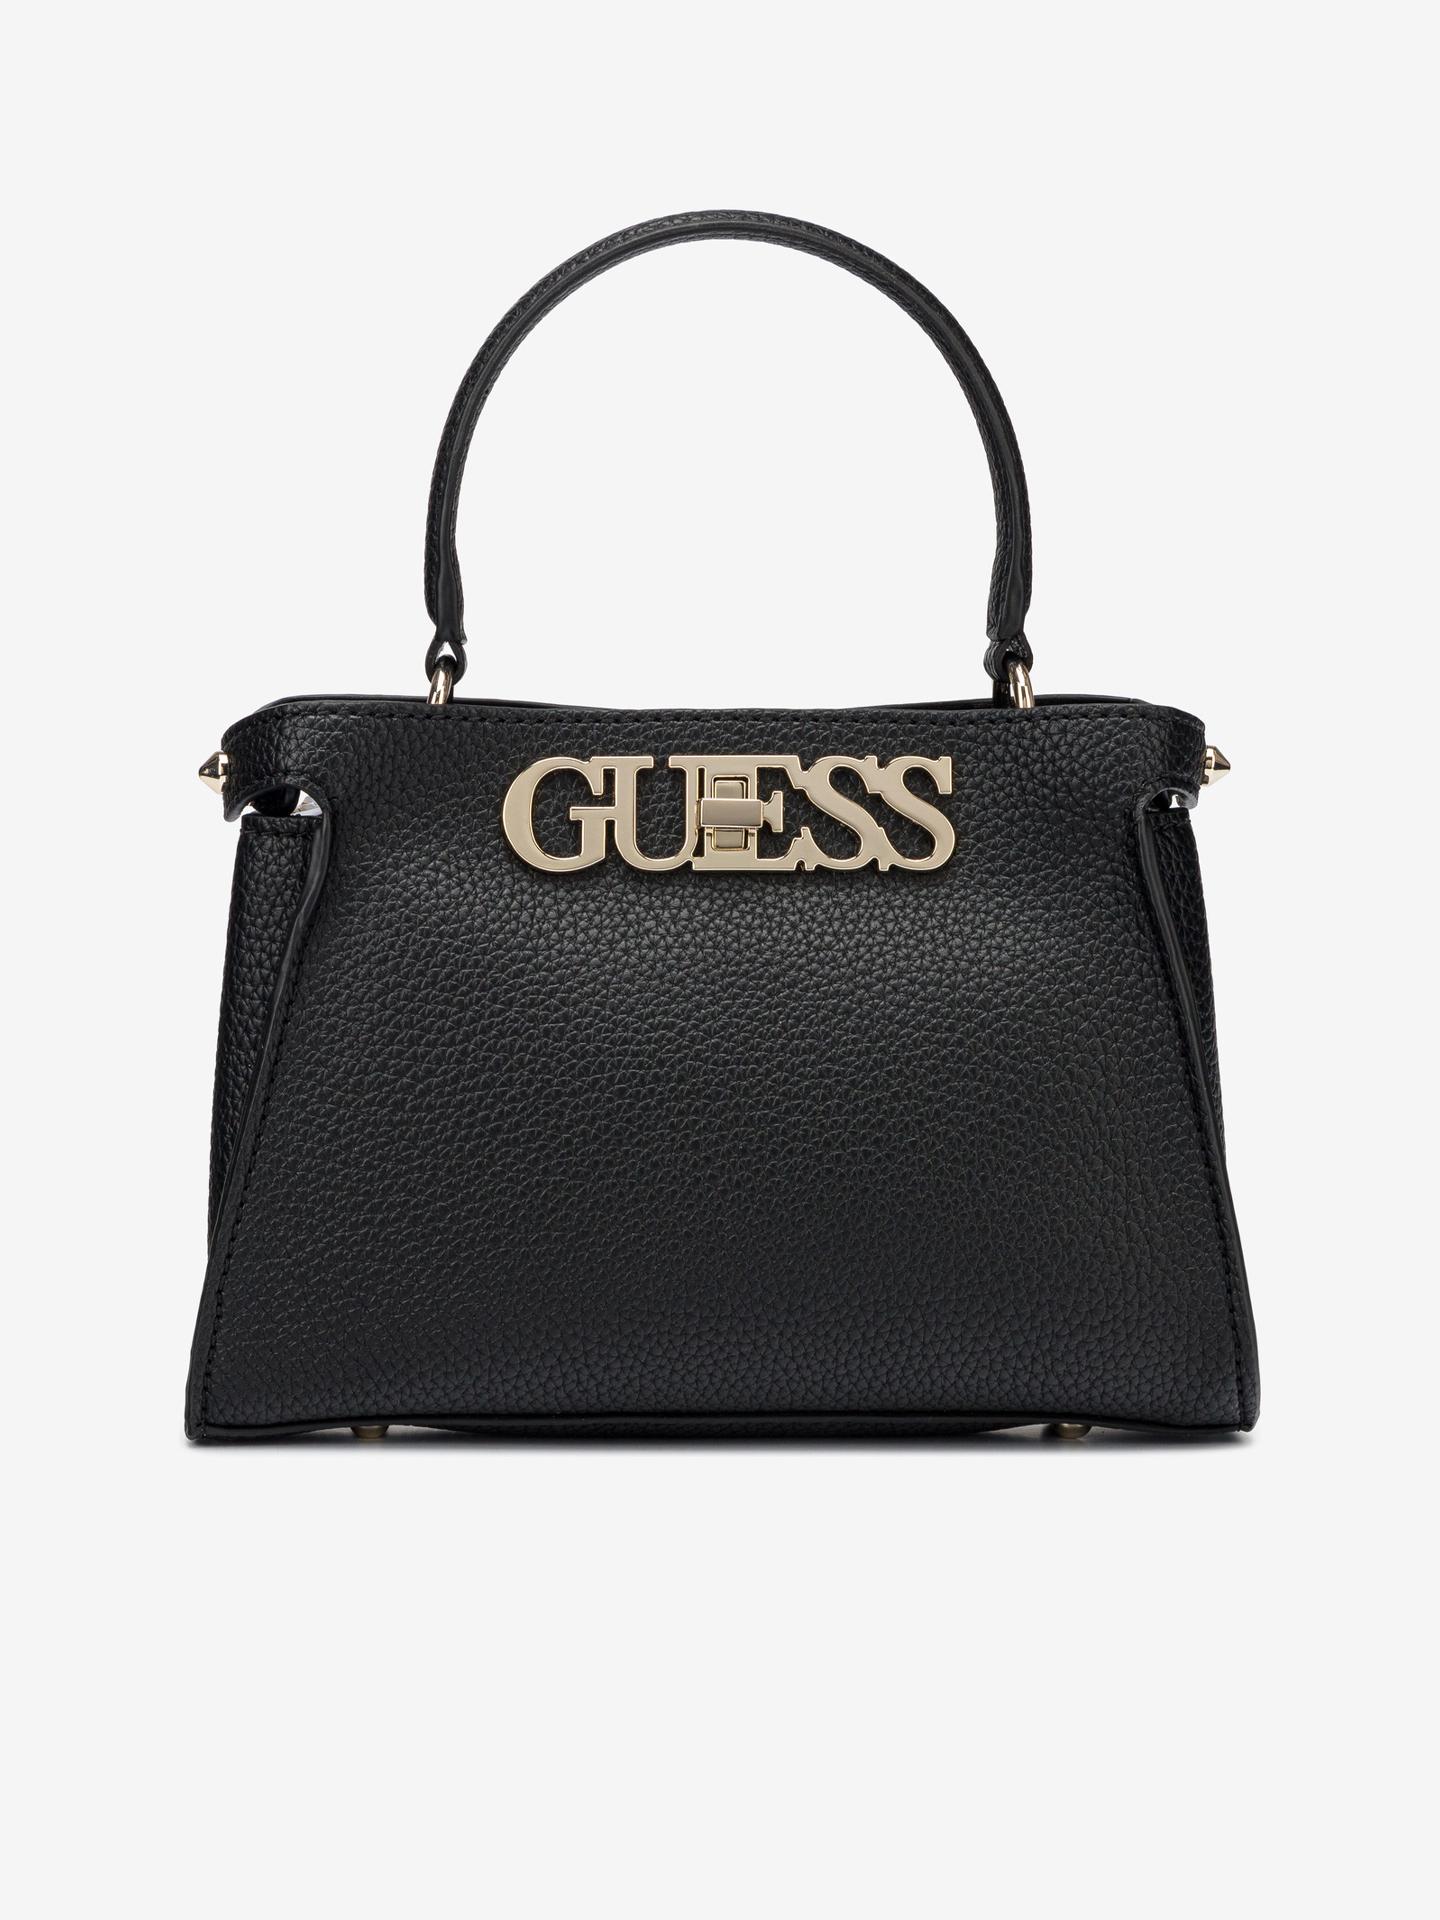 Guess black handbag Uptown Chic Small